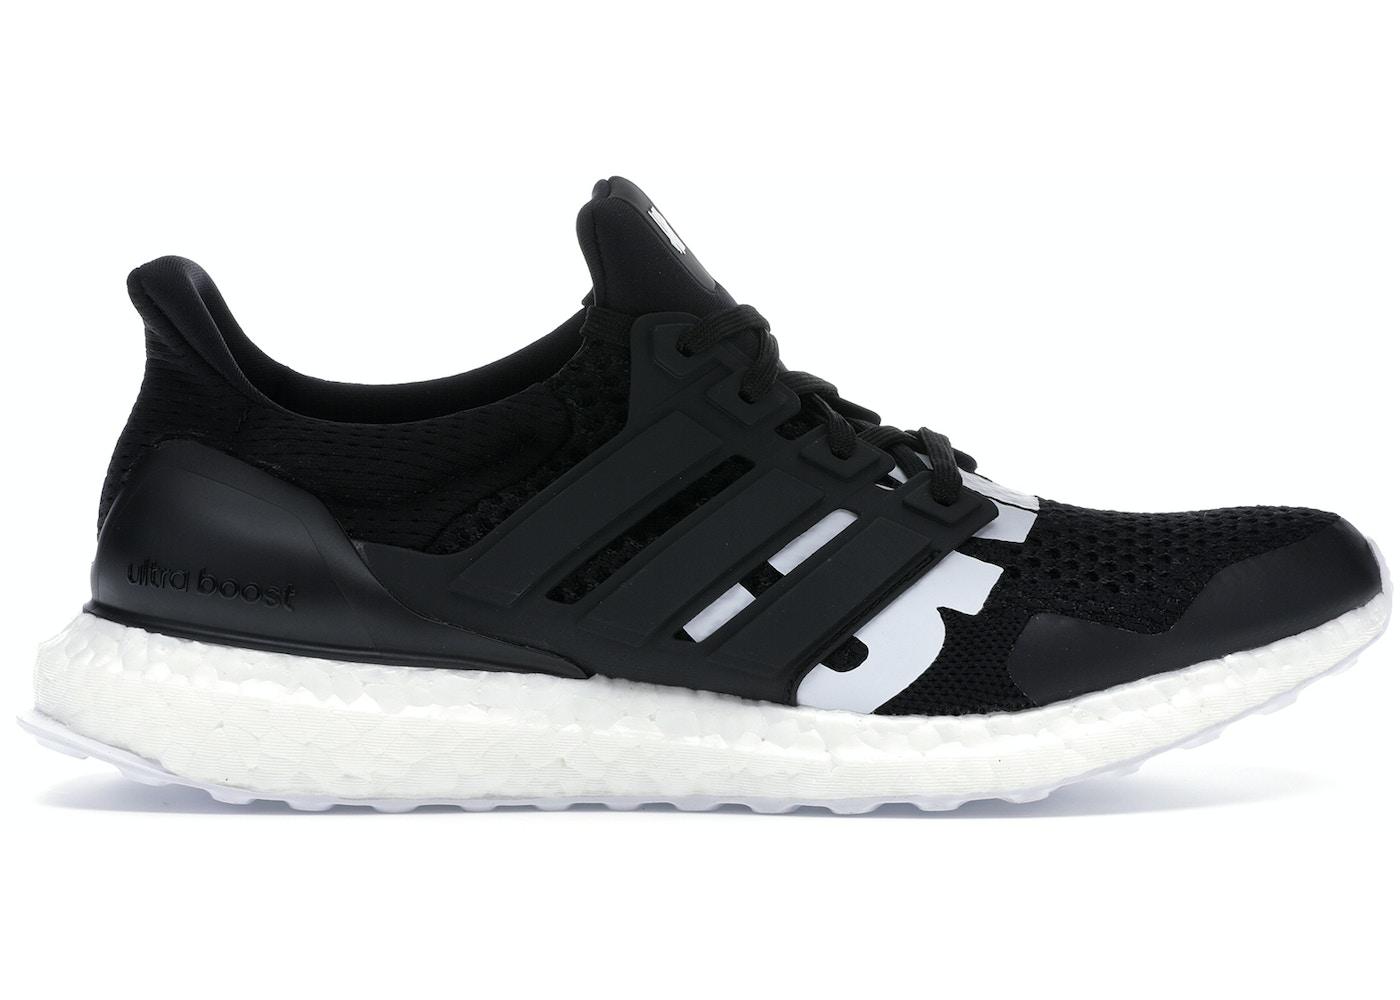 buy online e4777 2f343 adidas Ultra Boost 1.0 UNDFTD Black